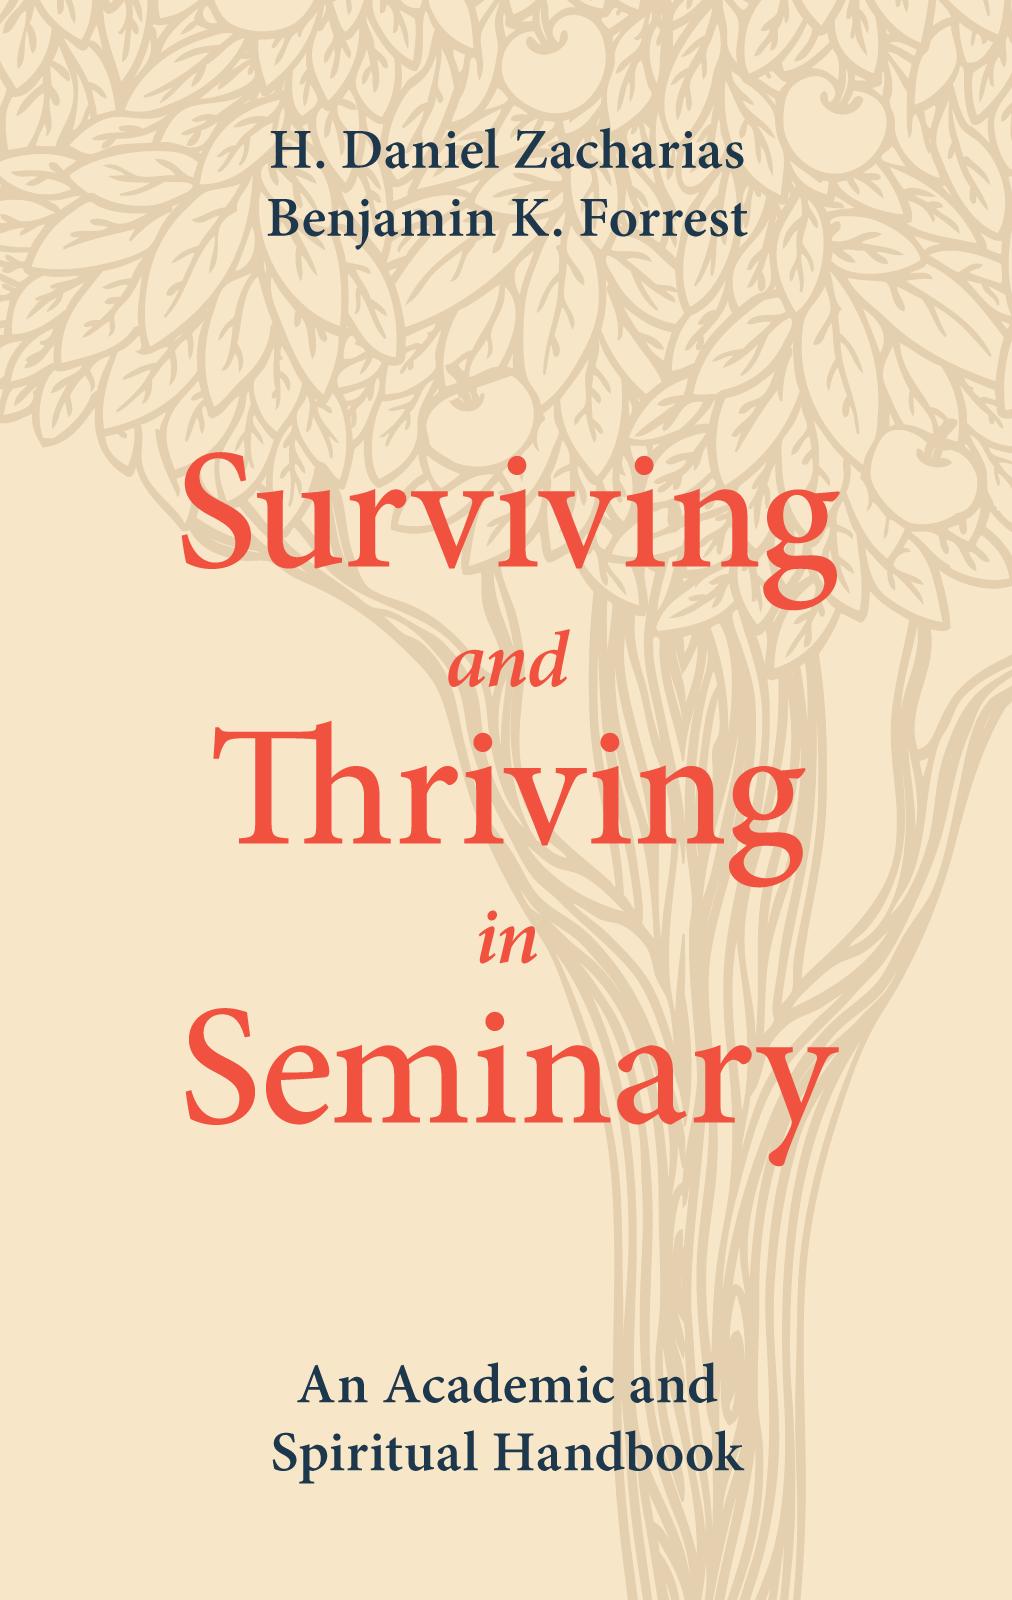 Surviving and Thriving in Seminary: An Academic and Spiritual Handbook